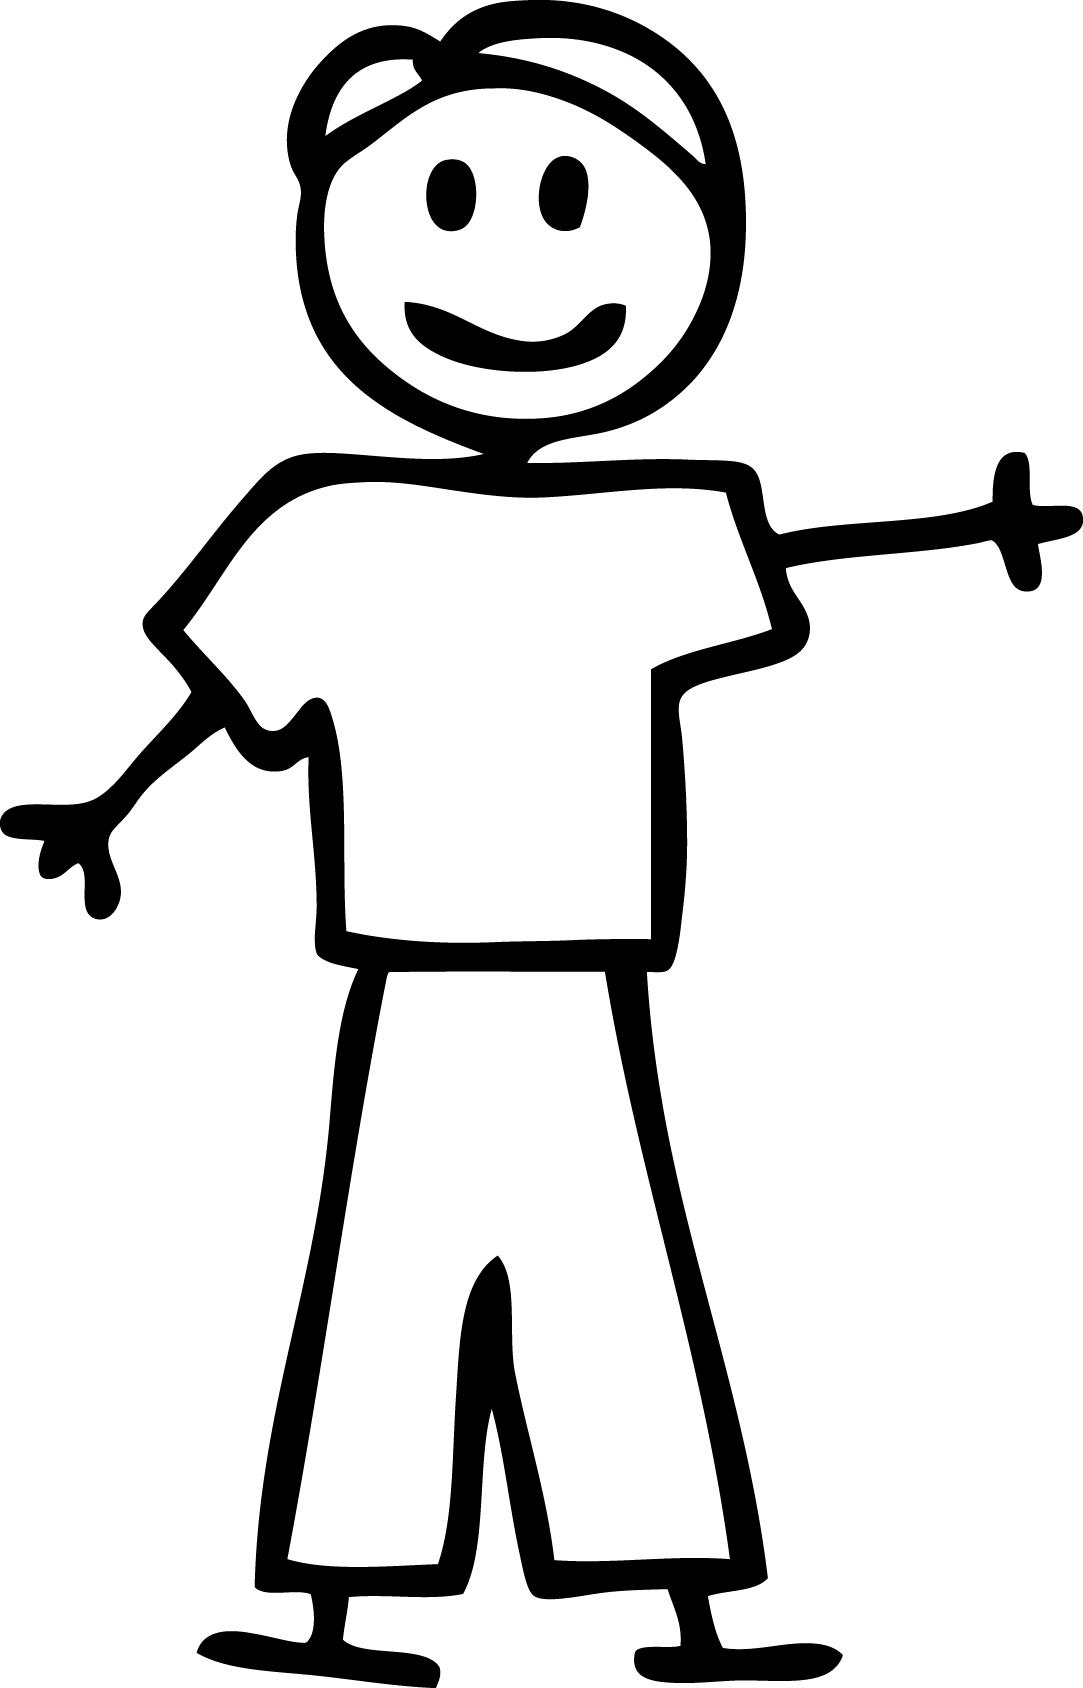 Stick Man Images